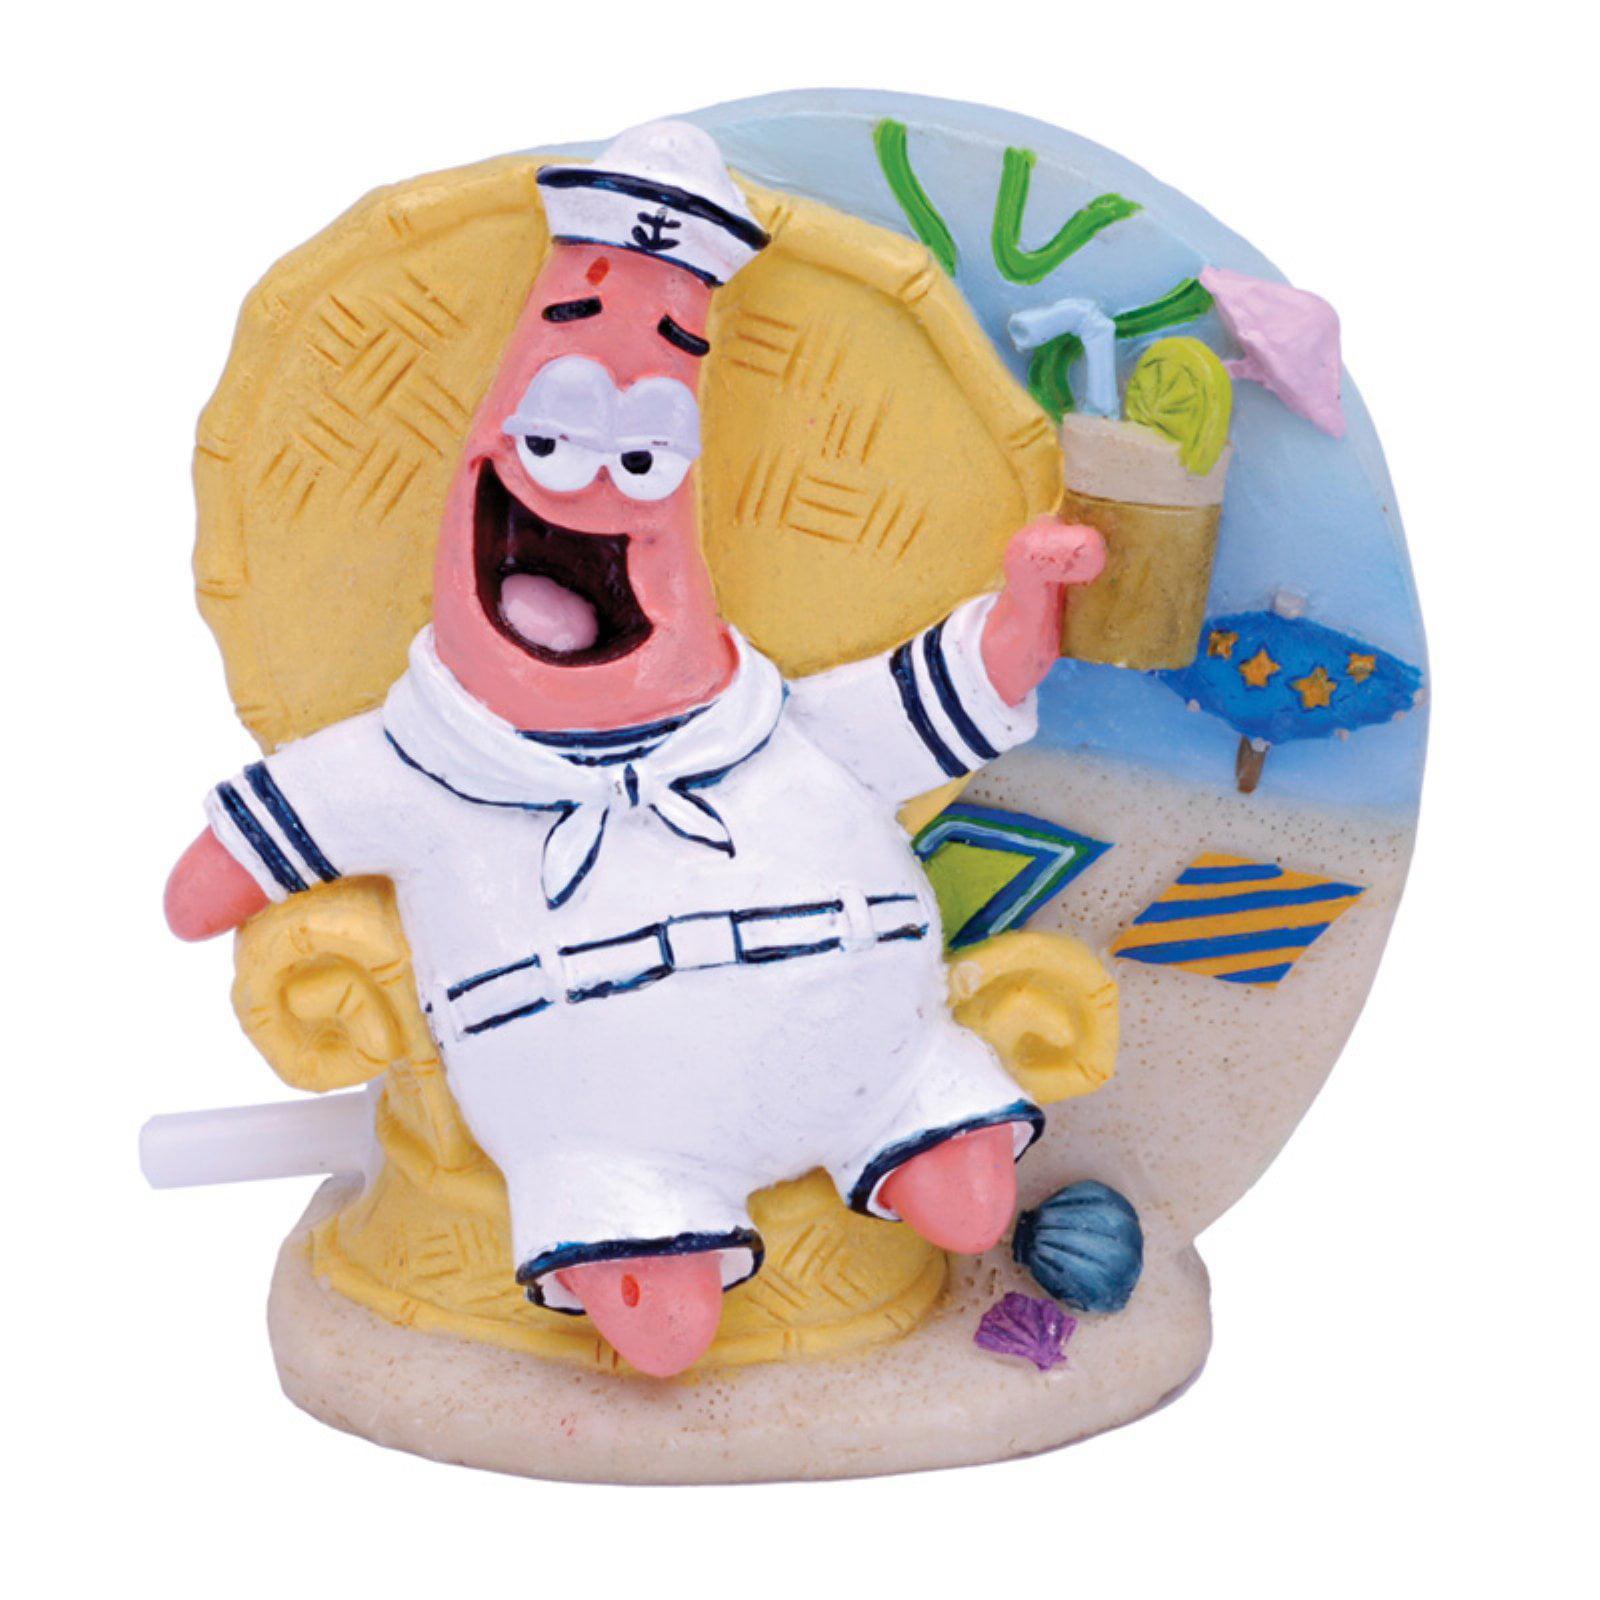 Penn Plax SpongeBob Patrick in Tiki Lounge Chair  Aquarium Figure